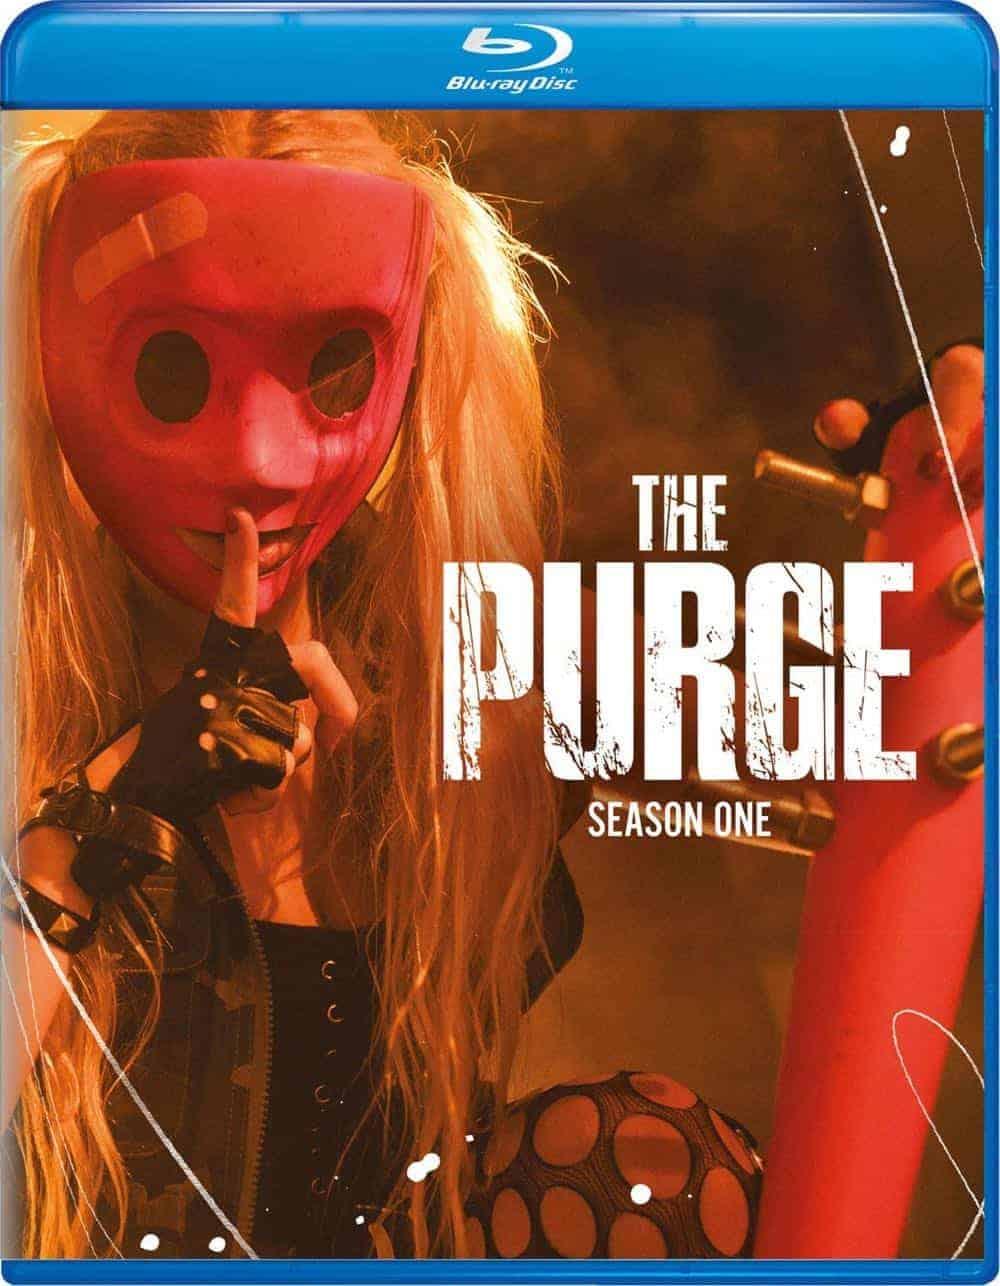 The Purge Season 1 Bluray